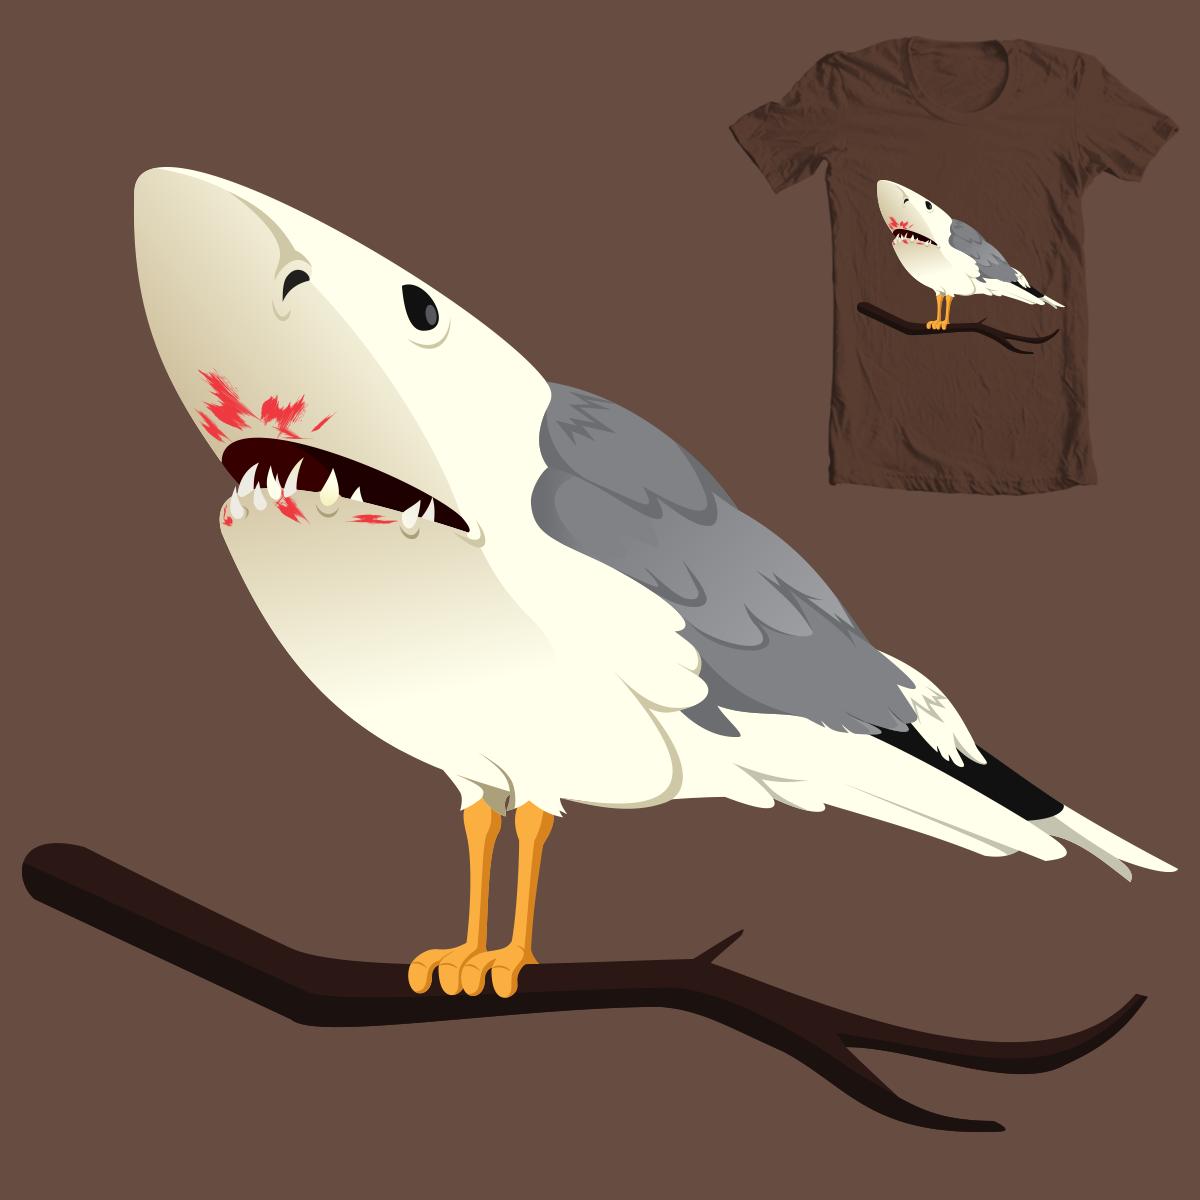 Birdshark by epiccoders on Threadless